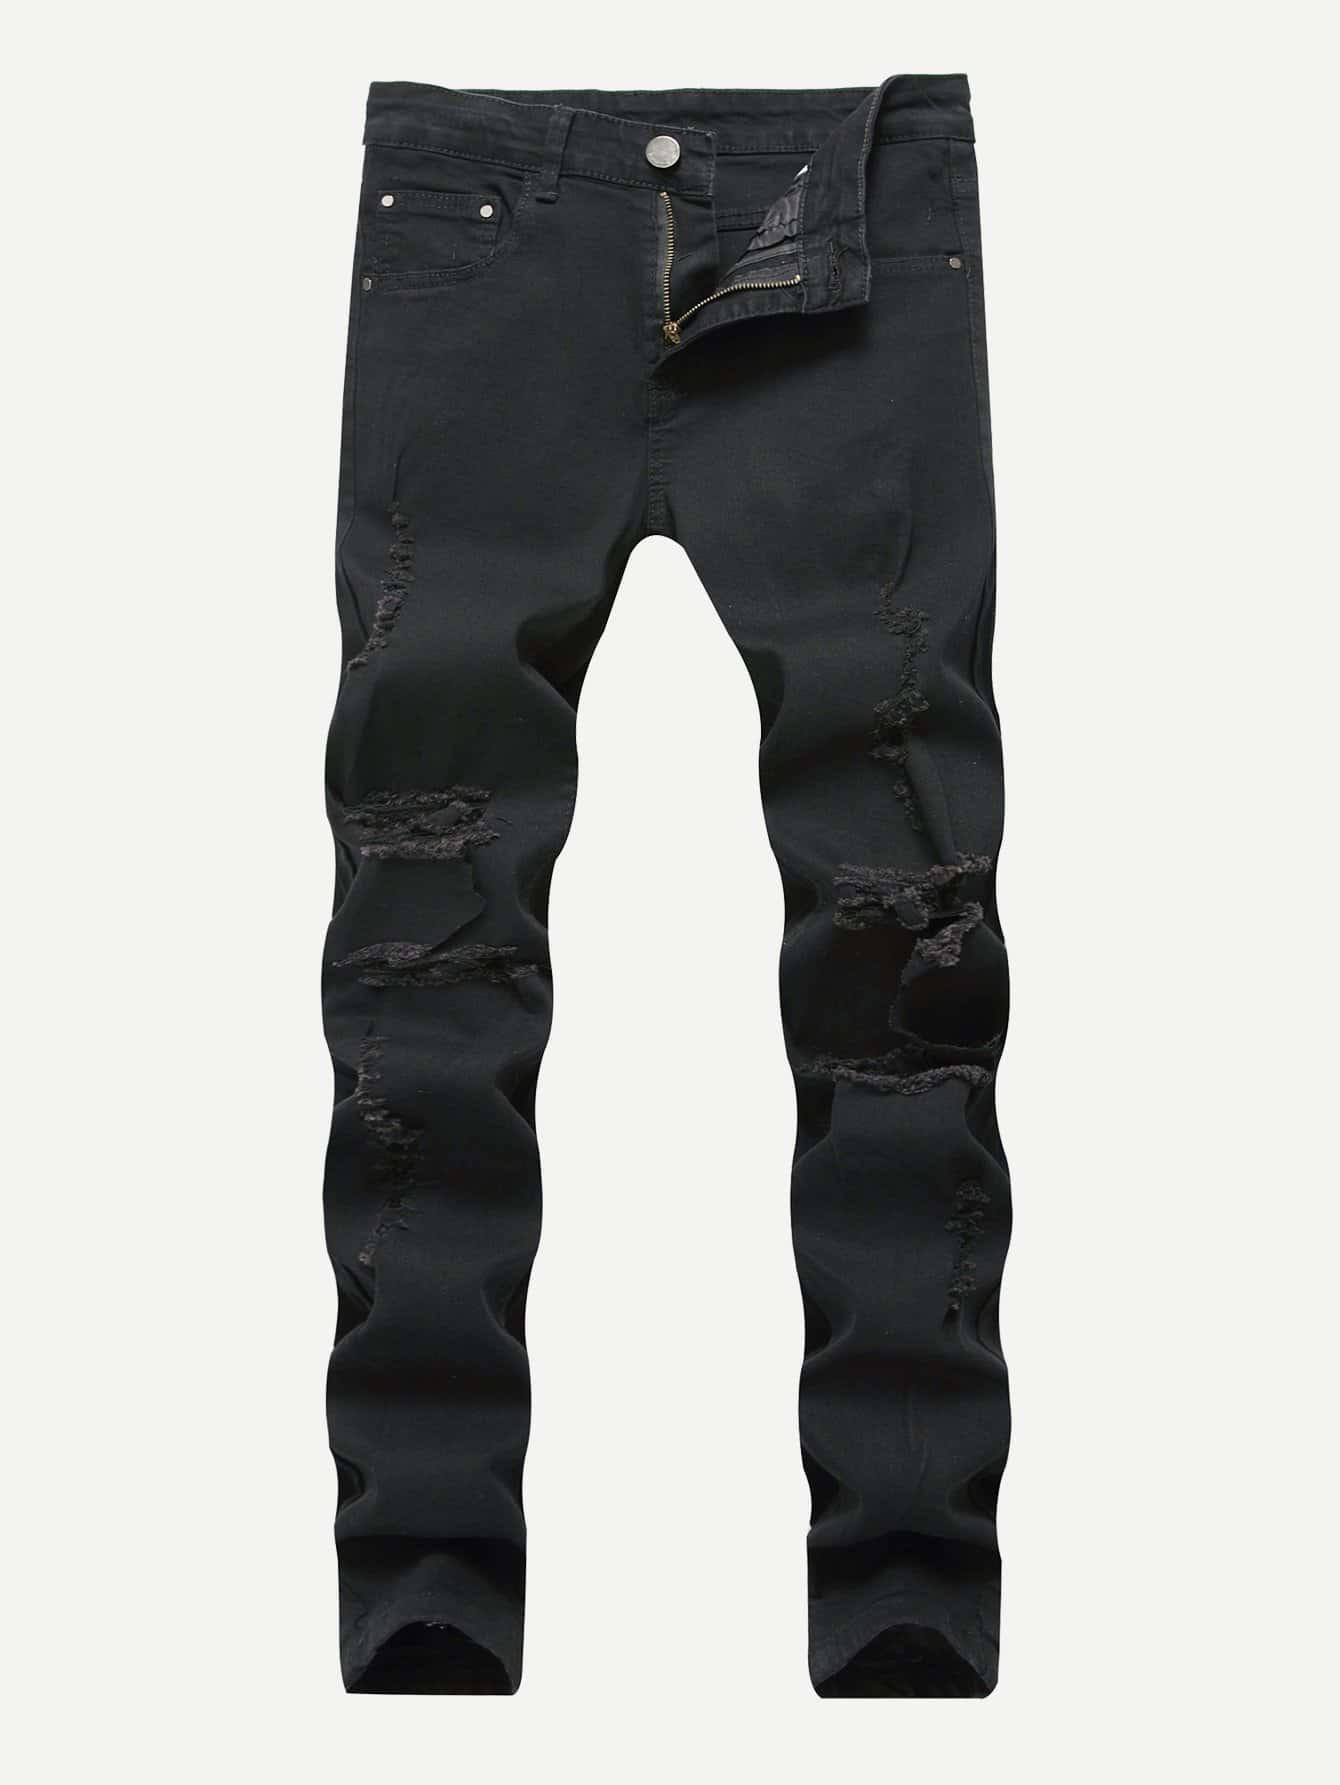 Men Rose Embroidery Skinny Destroyed Jeans купить